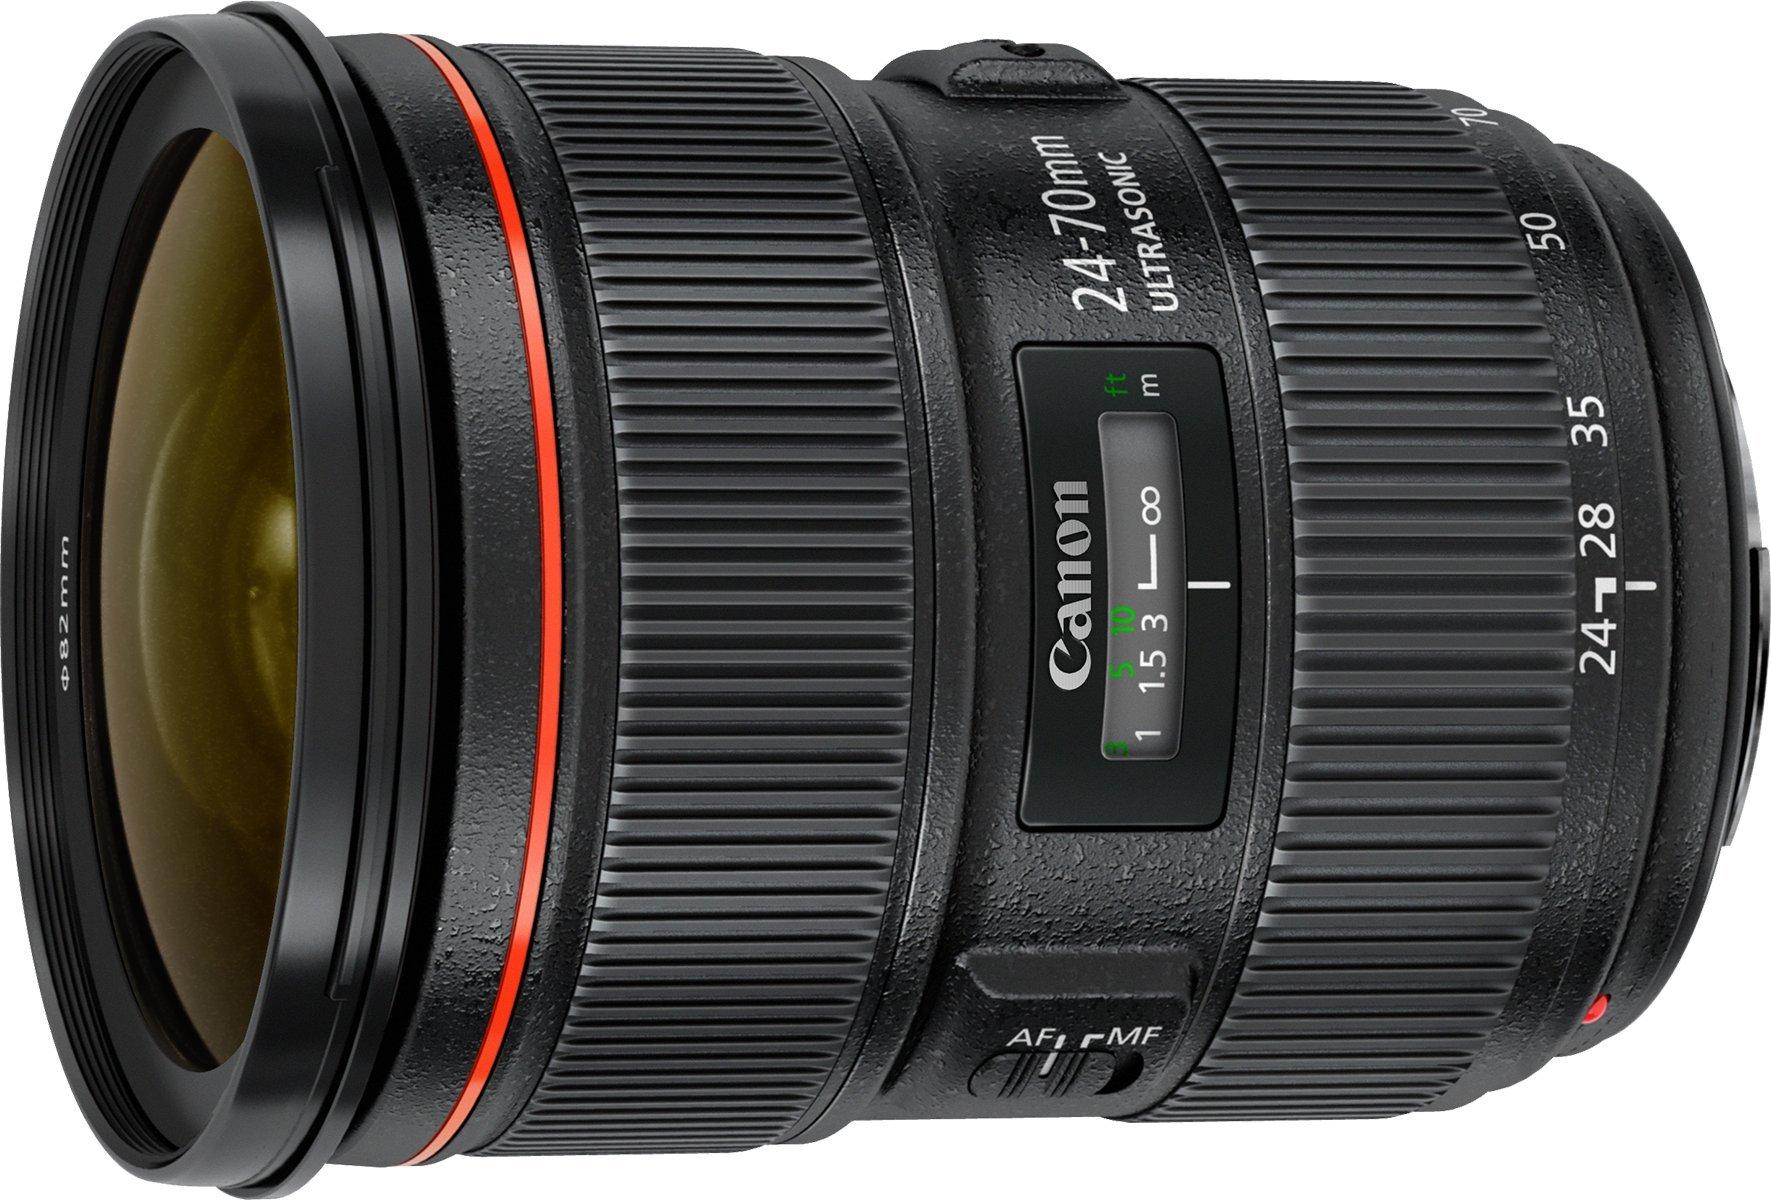 EF 24-70mm F/2.8L II USM Zoom Lens - Buy Online in Botswana ...